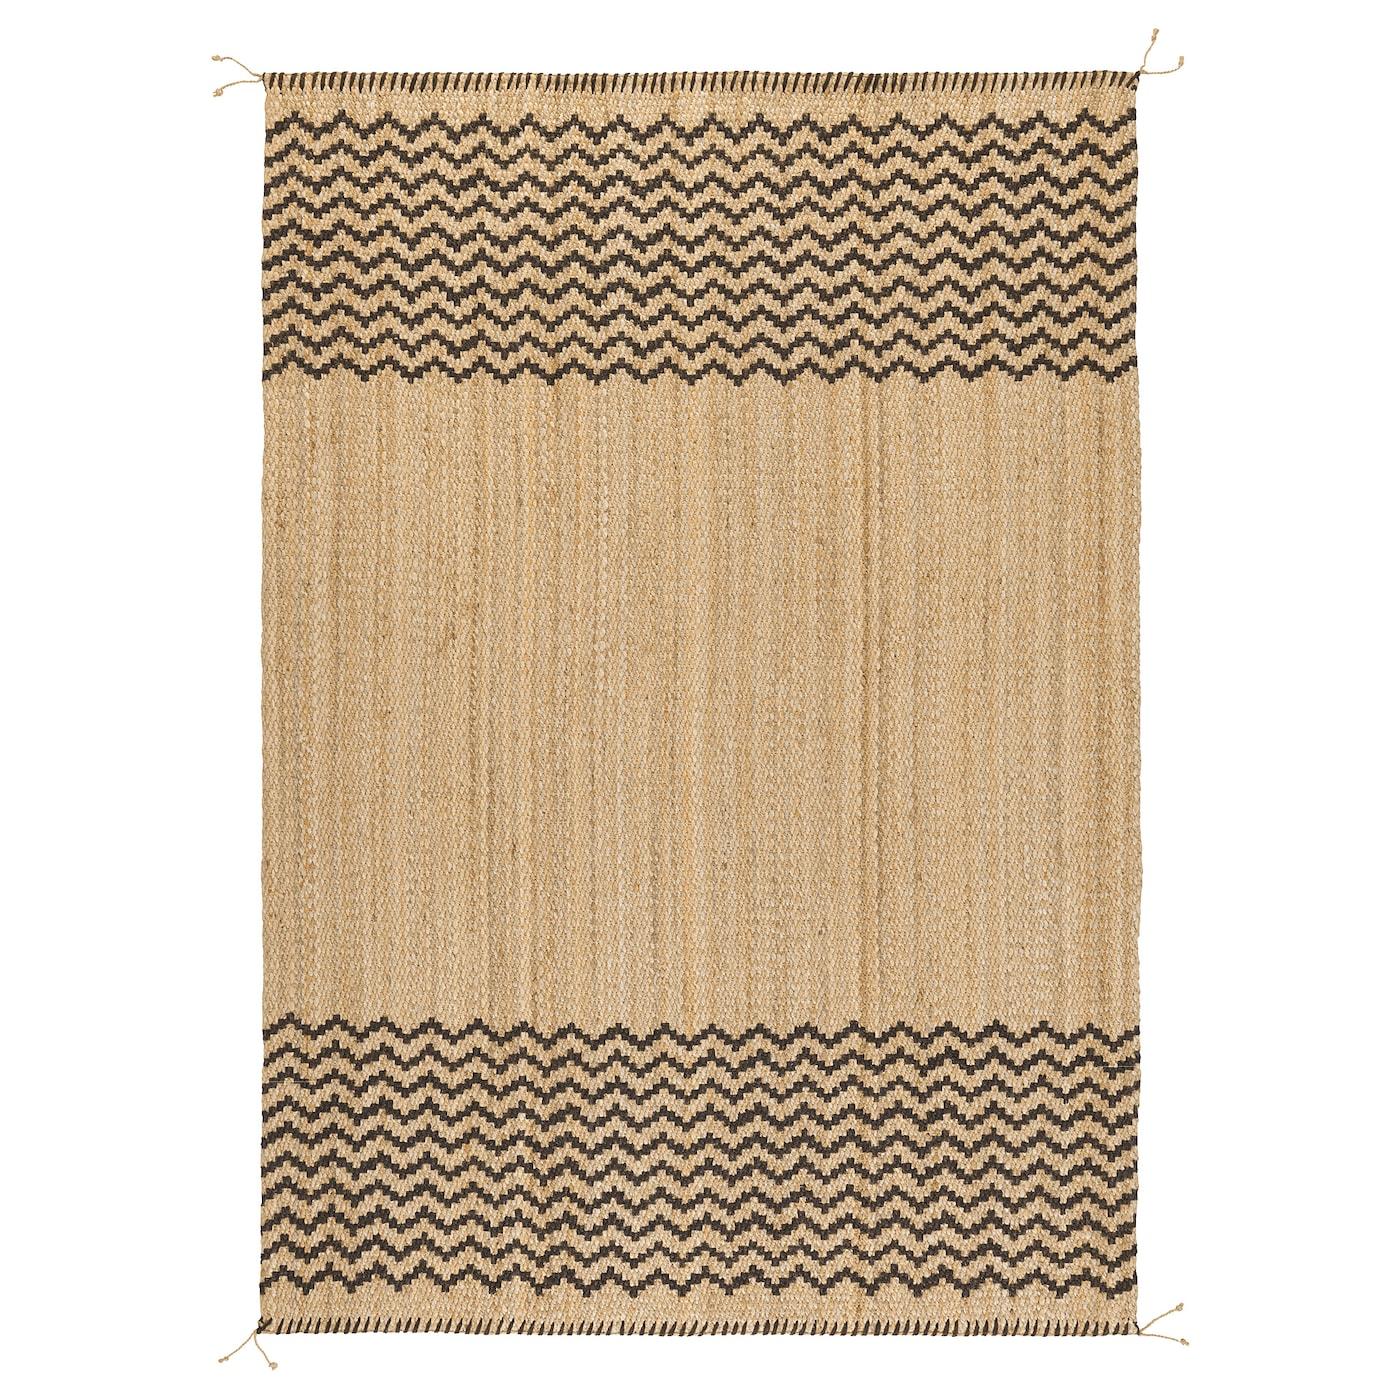 LÖNHOLT Alfombra - natural, marrón oscuro verde - IKEA